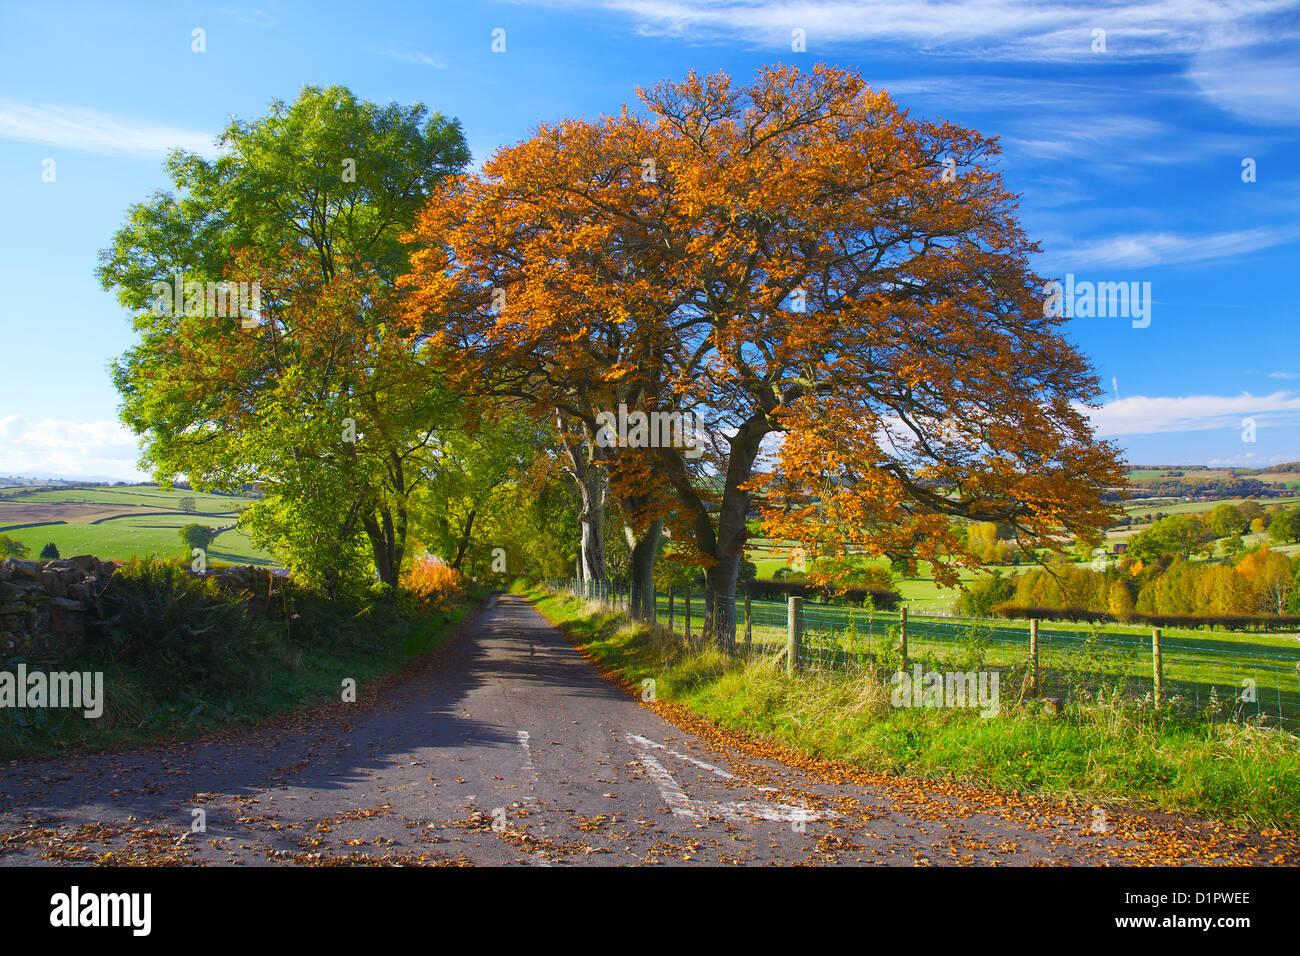 Road junction autumn trees.Eden Valley, Cumbria, England UK - Stock Image